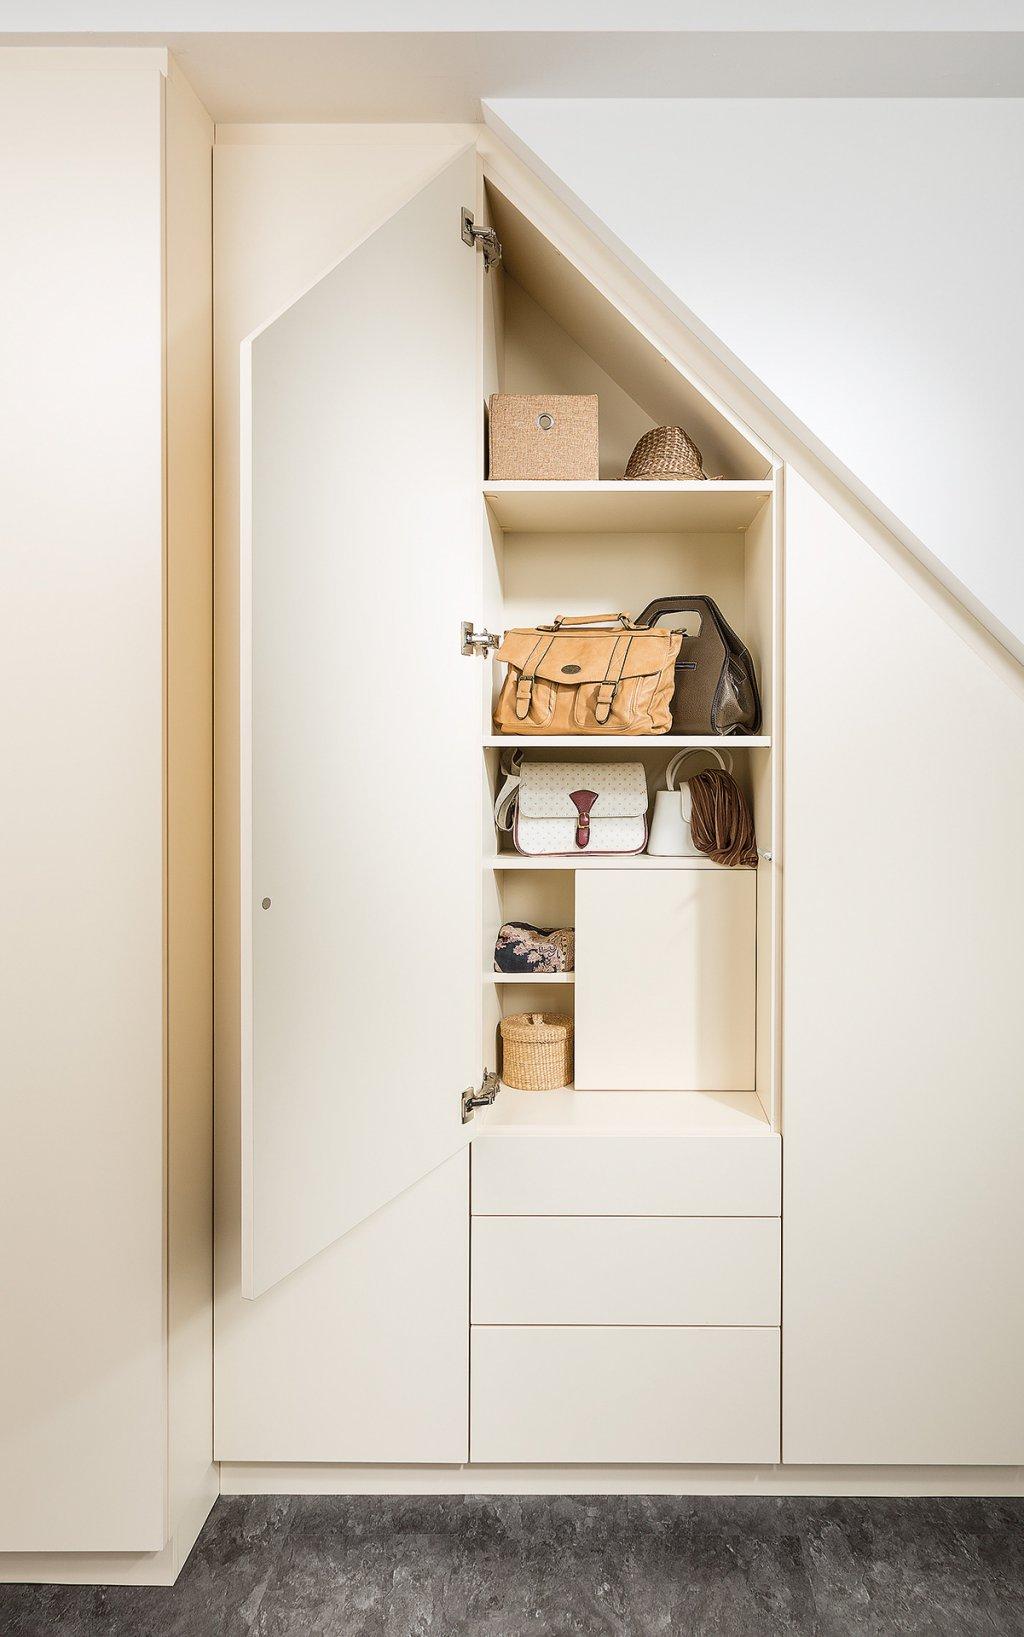 schrank dachschrge gnstig latest als begehbarer with schrank dachschrge gnstig good begehbarer. Black Bedroom Furniture Sets. Home Design Ideas